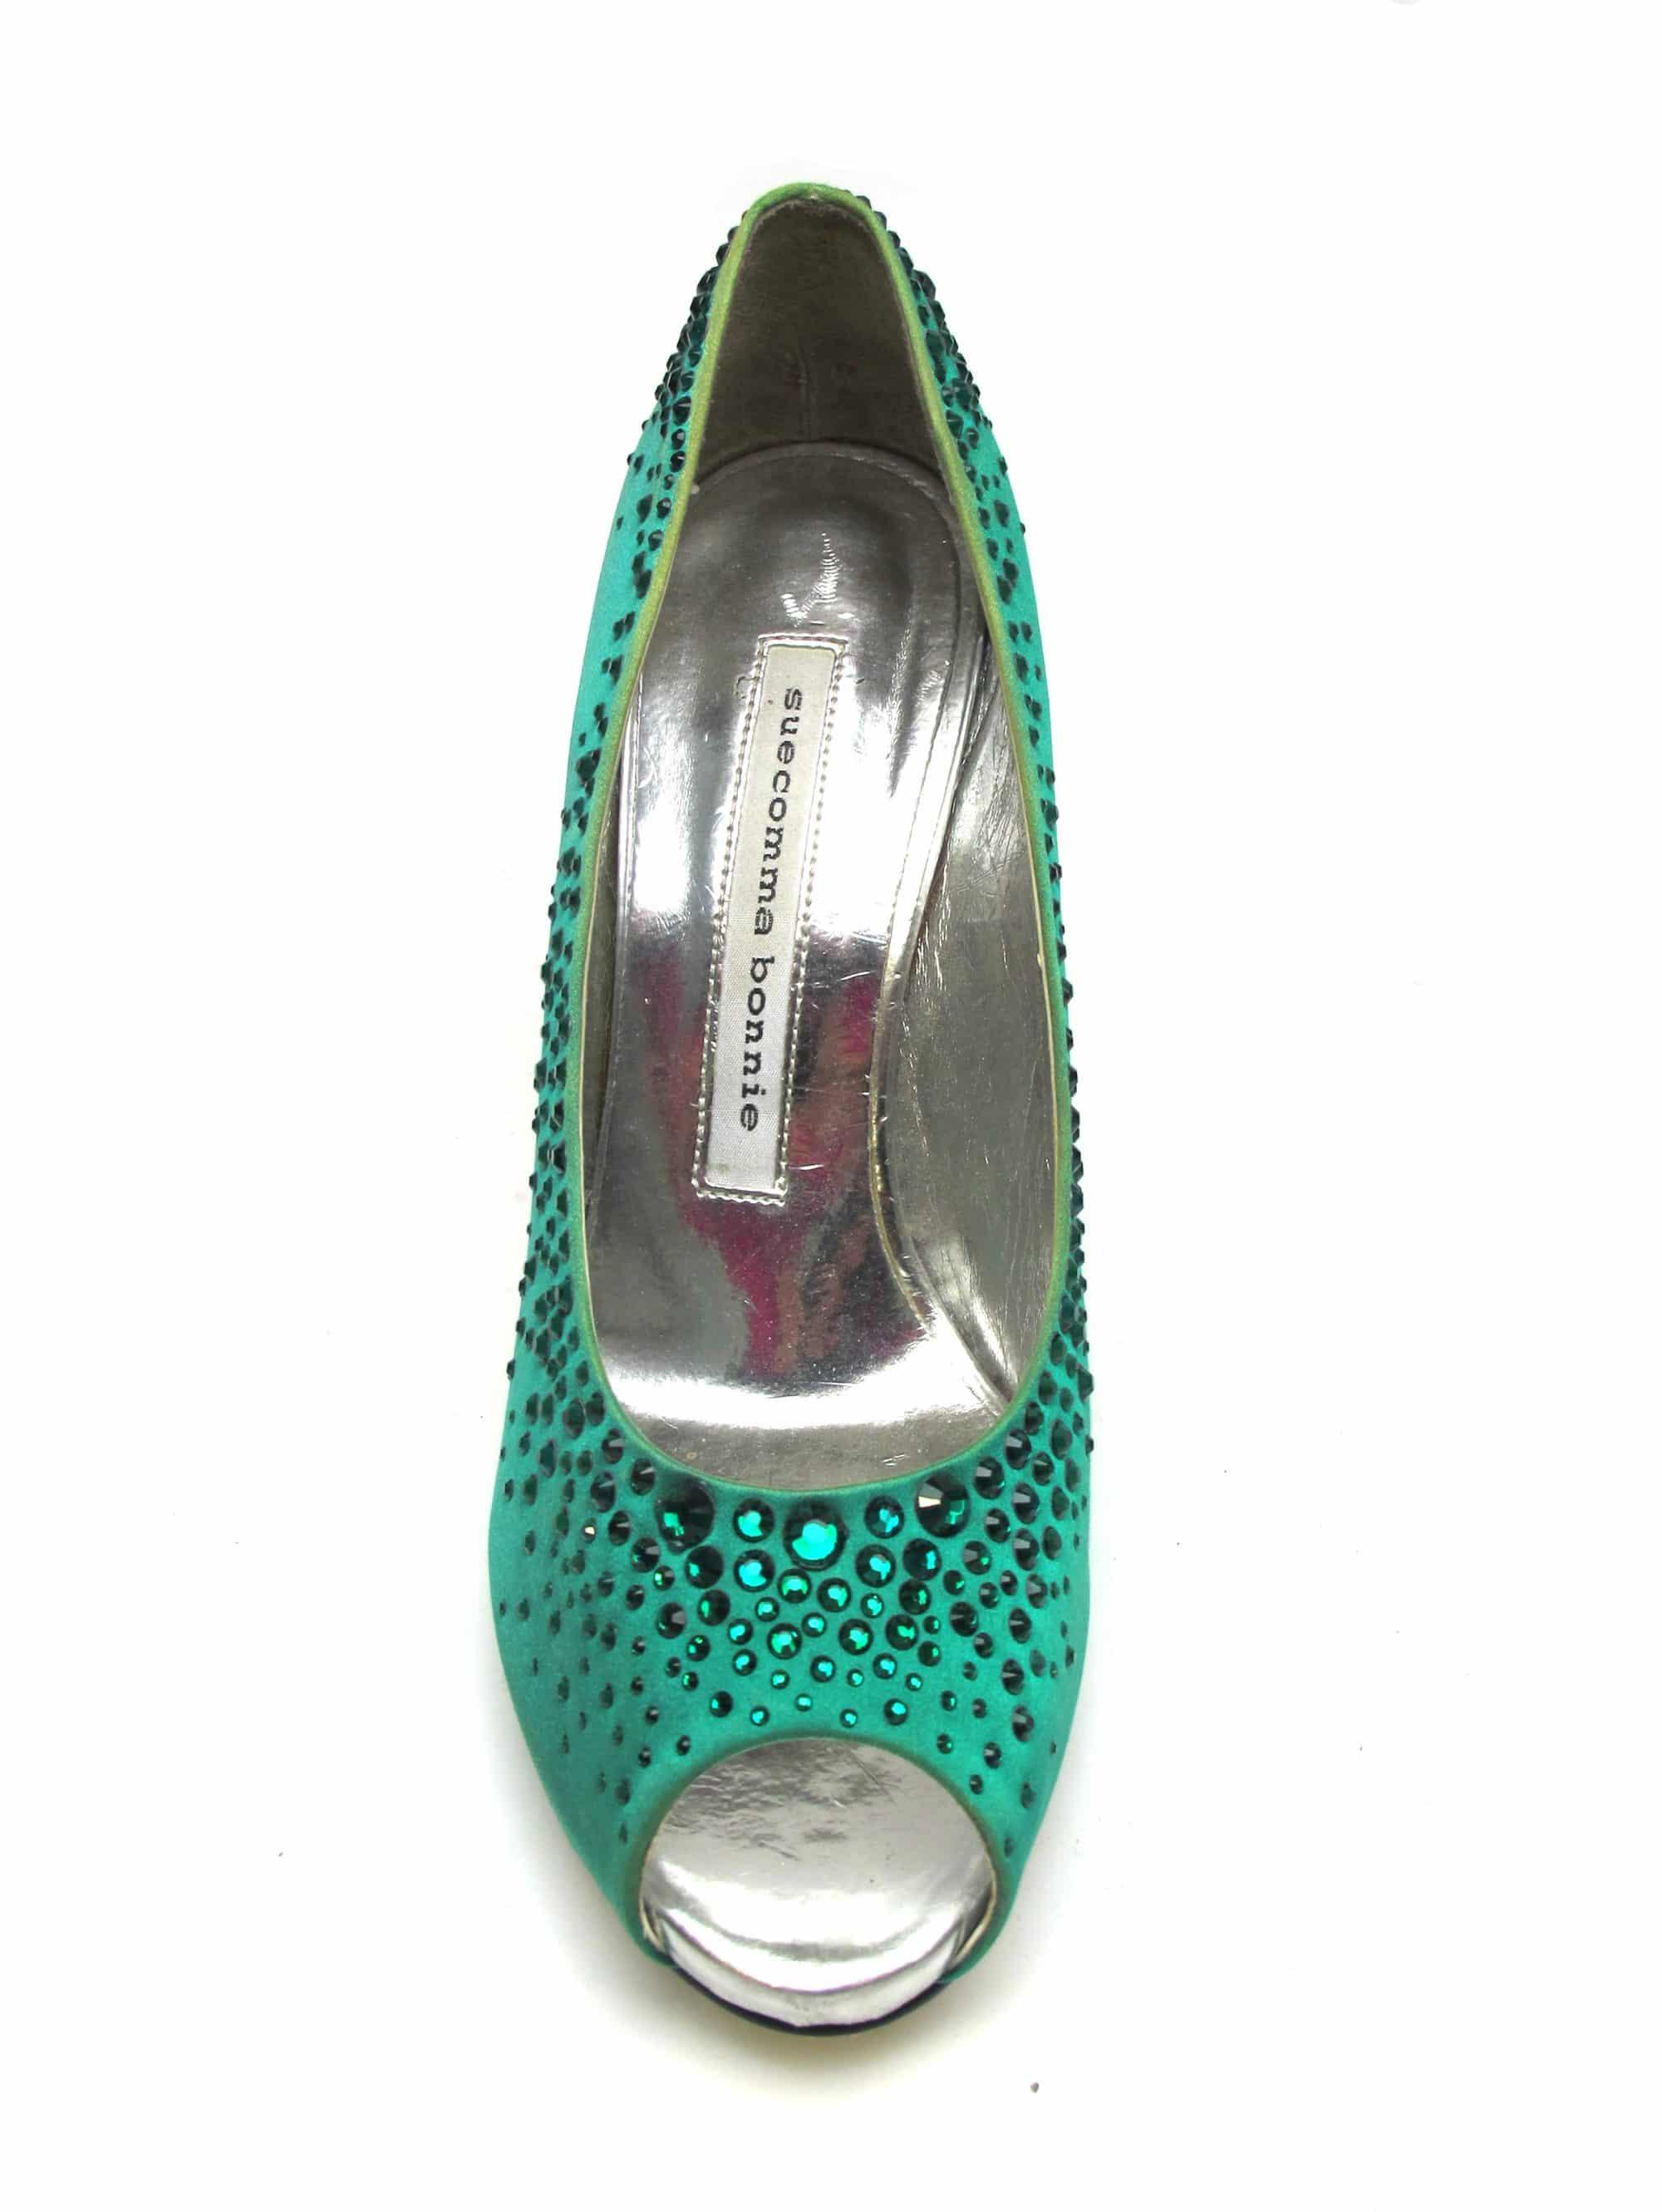 Suecomma Bonnie Emerald green heels with swarovski crystals